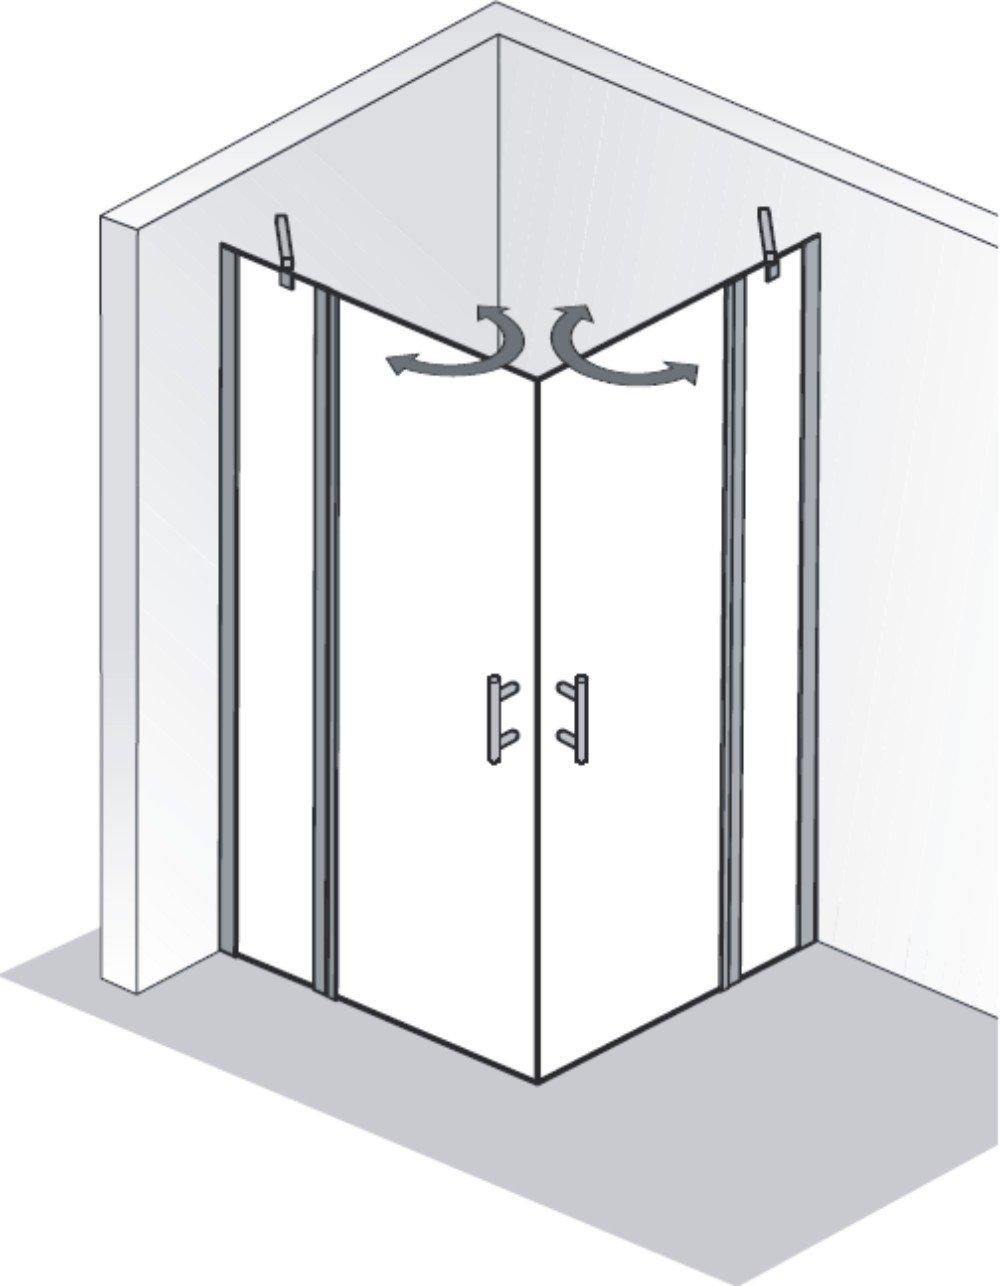 hsk duschkabine favorit nova b eckdusche 2 pendelt ren arcom center. Black Bedroom Furniture Sets. Home Design Ideas